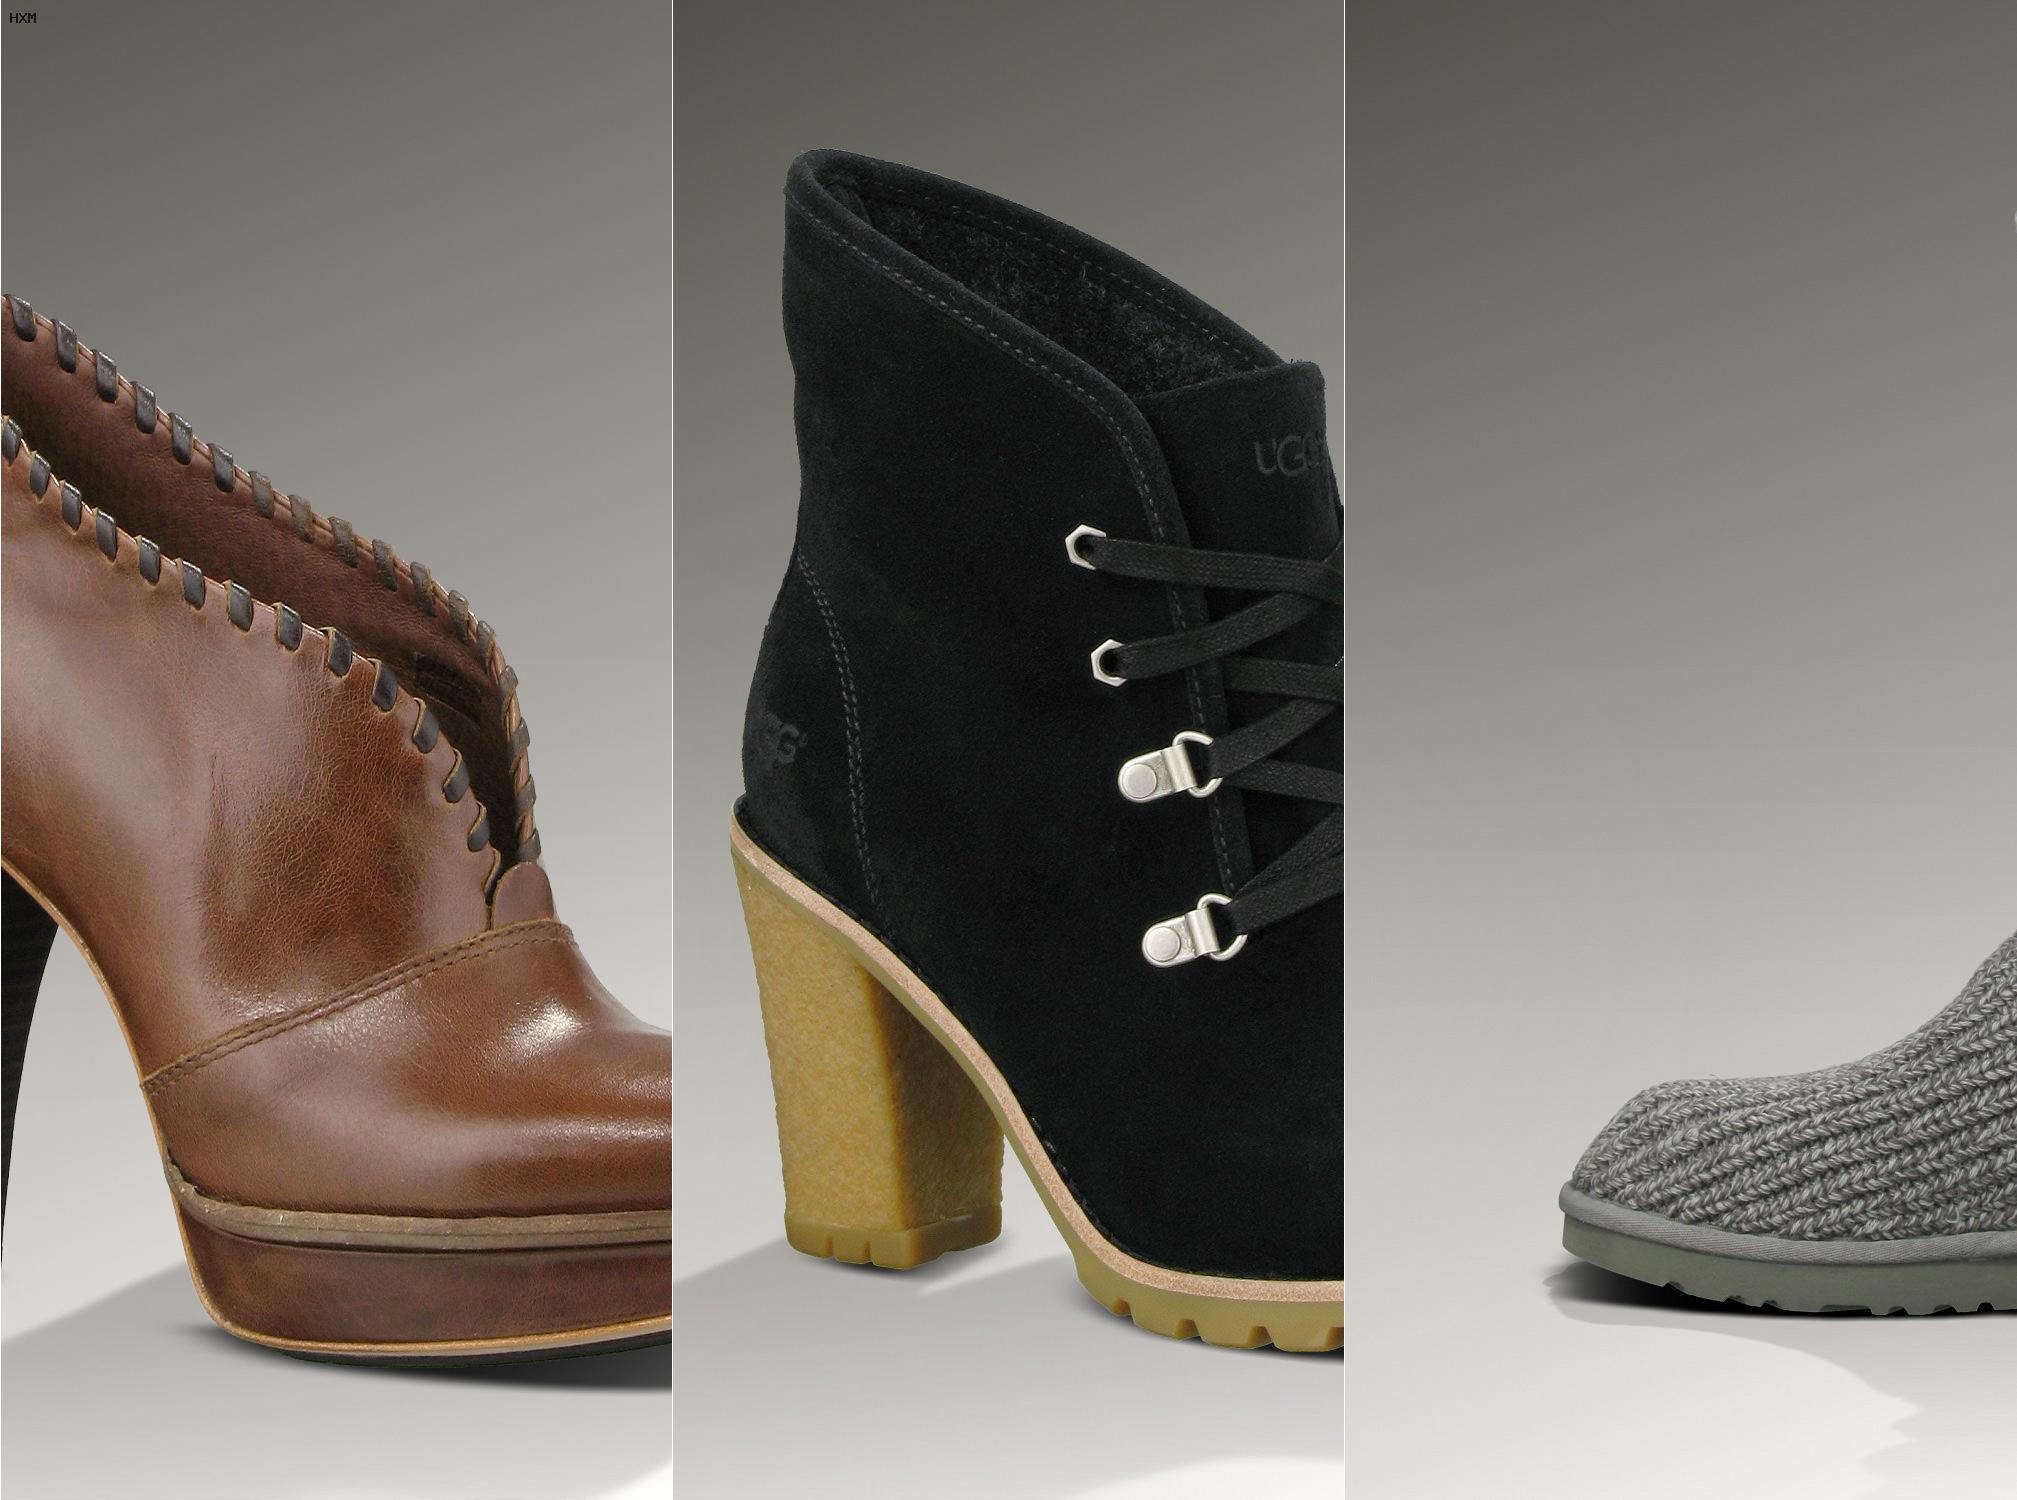 ugg chocolate boots